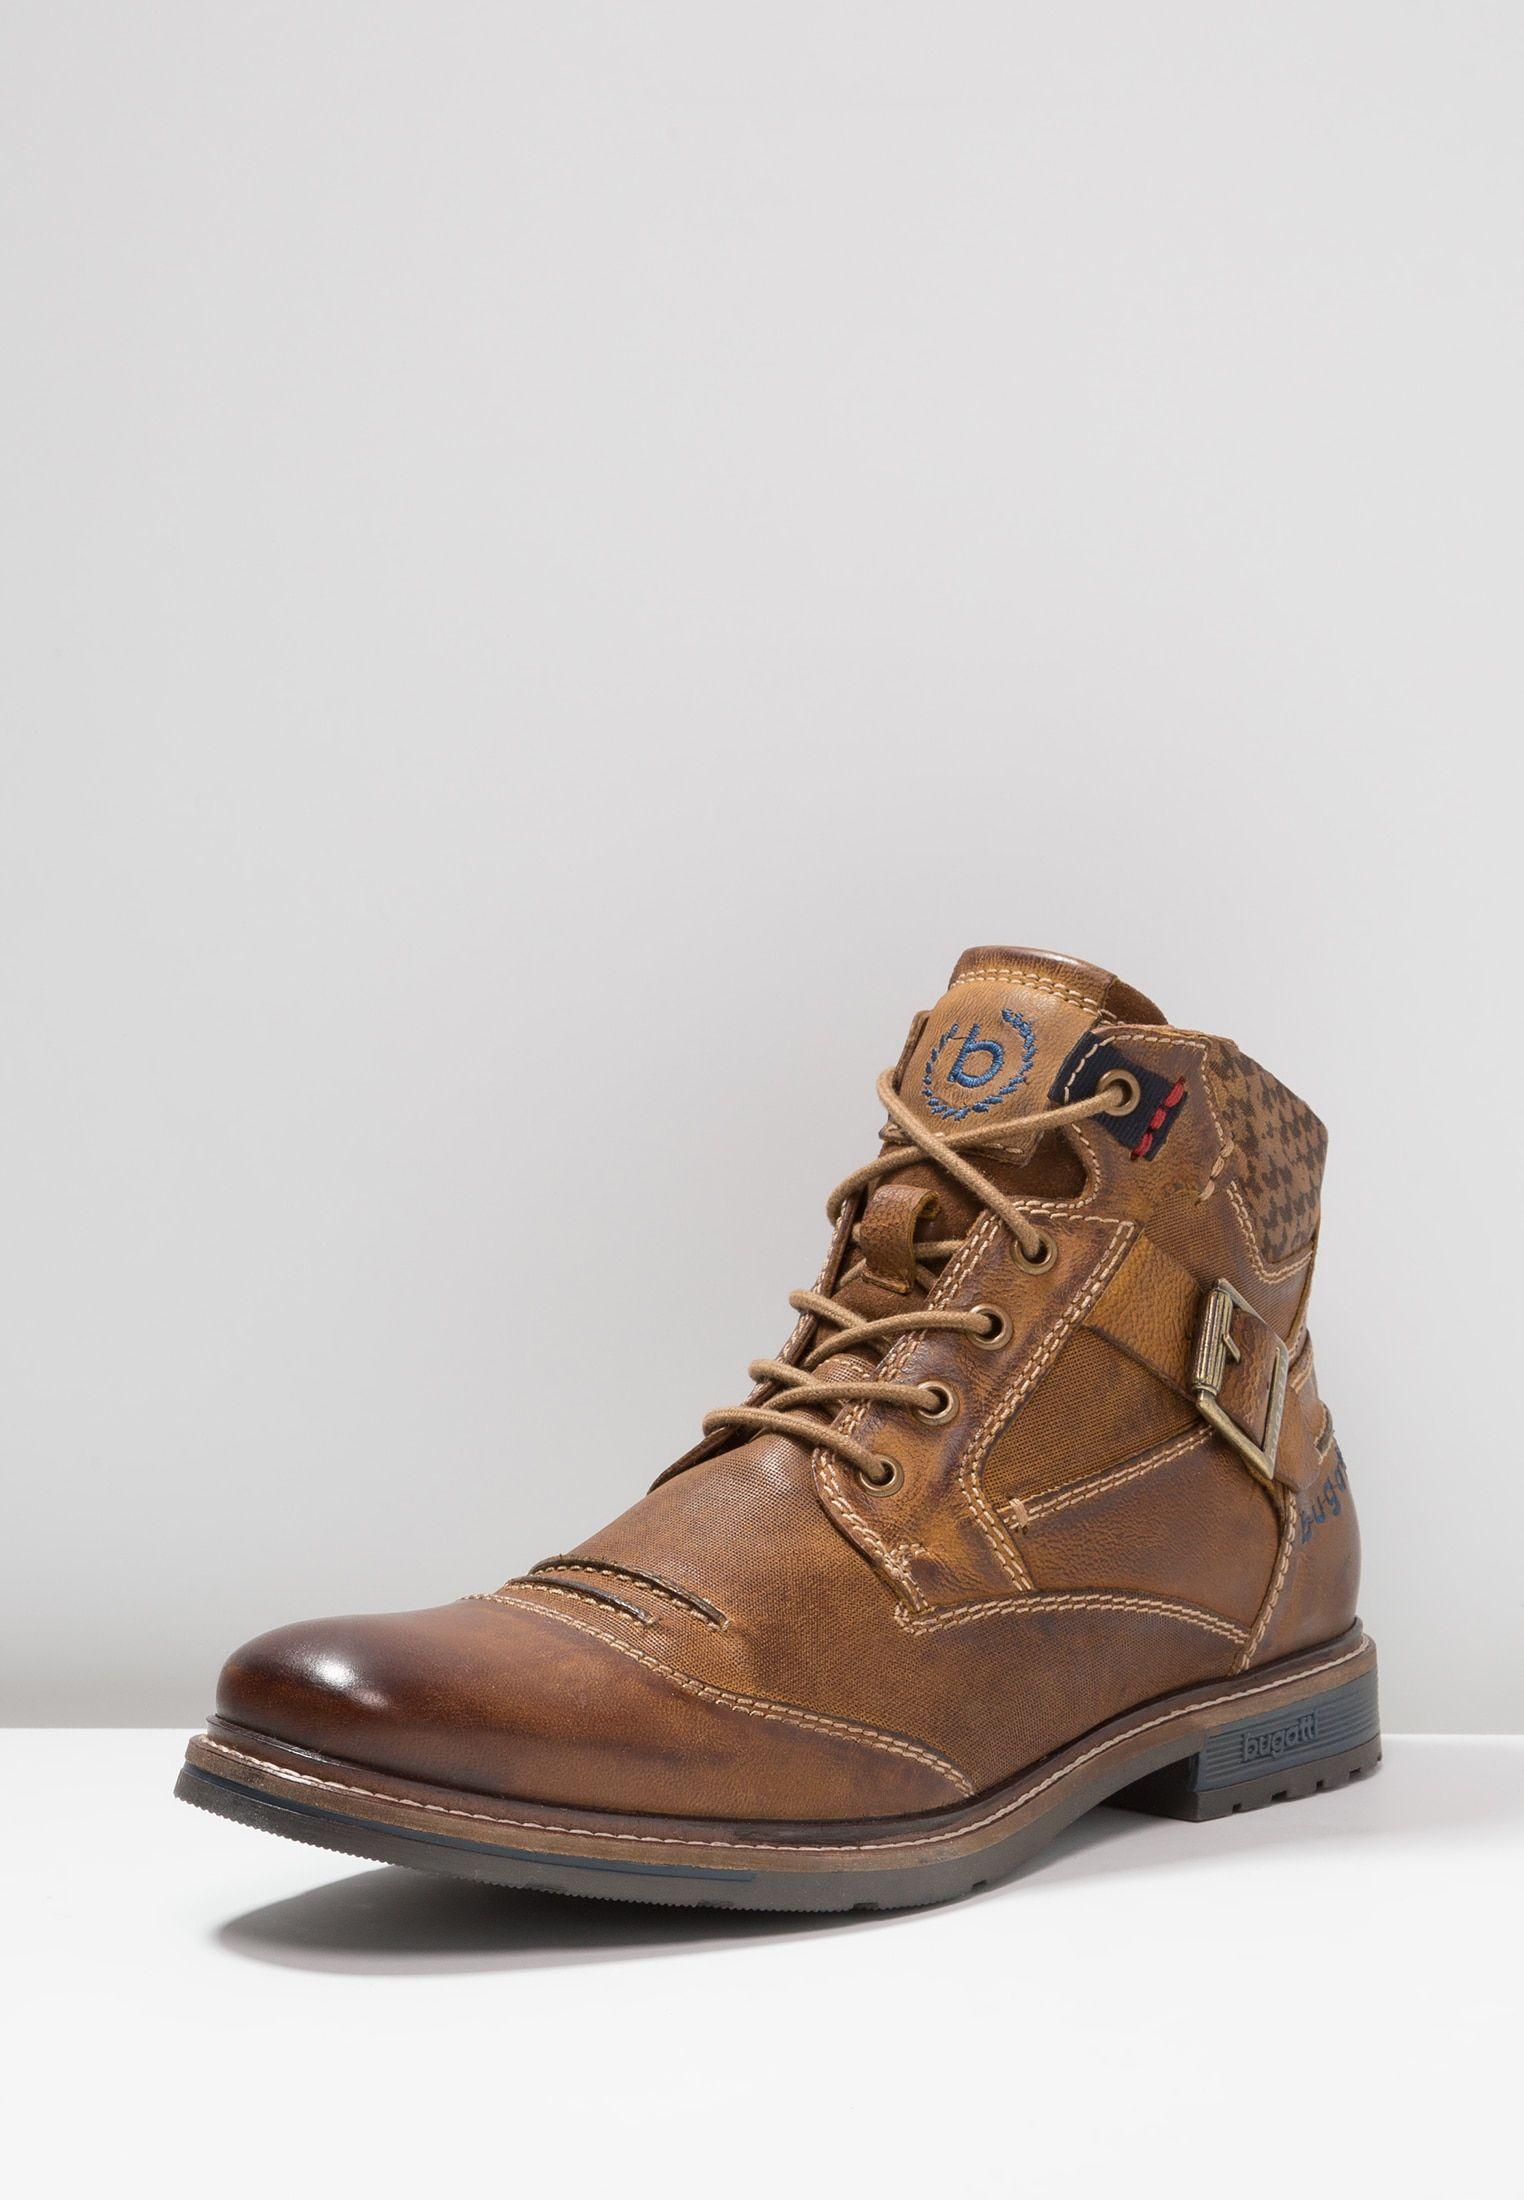 best sneakers 965a1 2d4d1 Lace-up ankle boots - cognac @ Zalando.co.uk 🛒 in 2019 ...